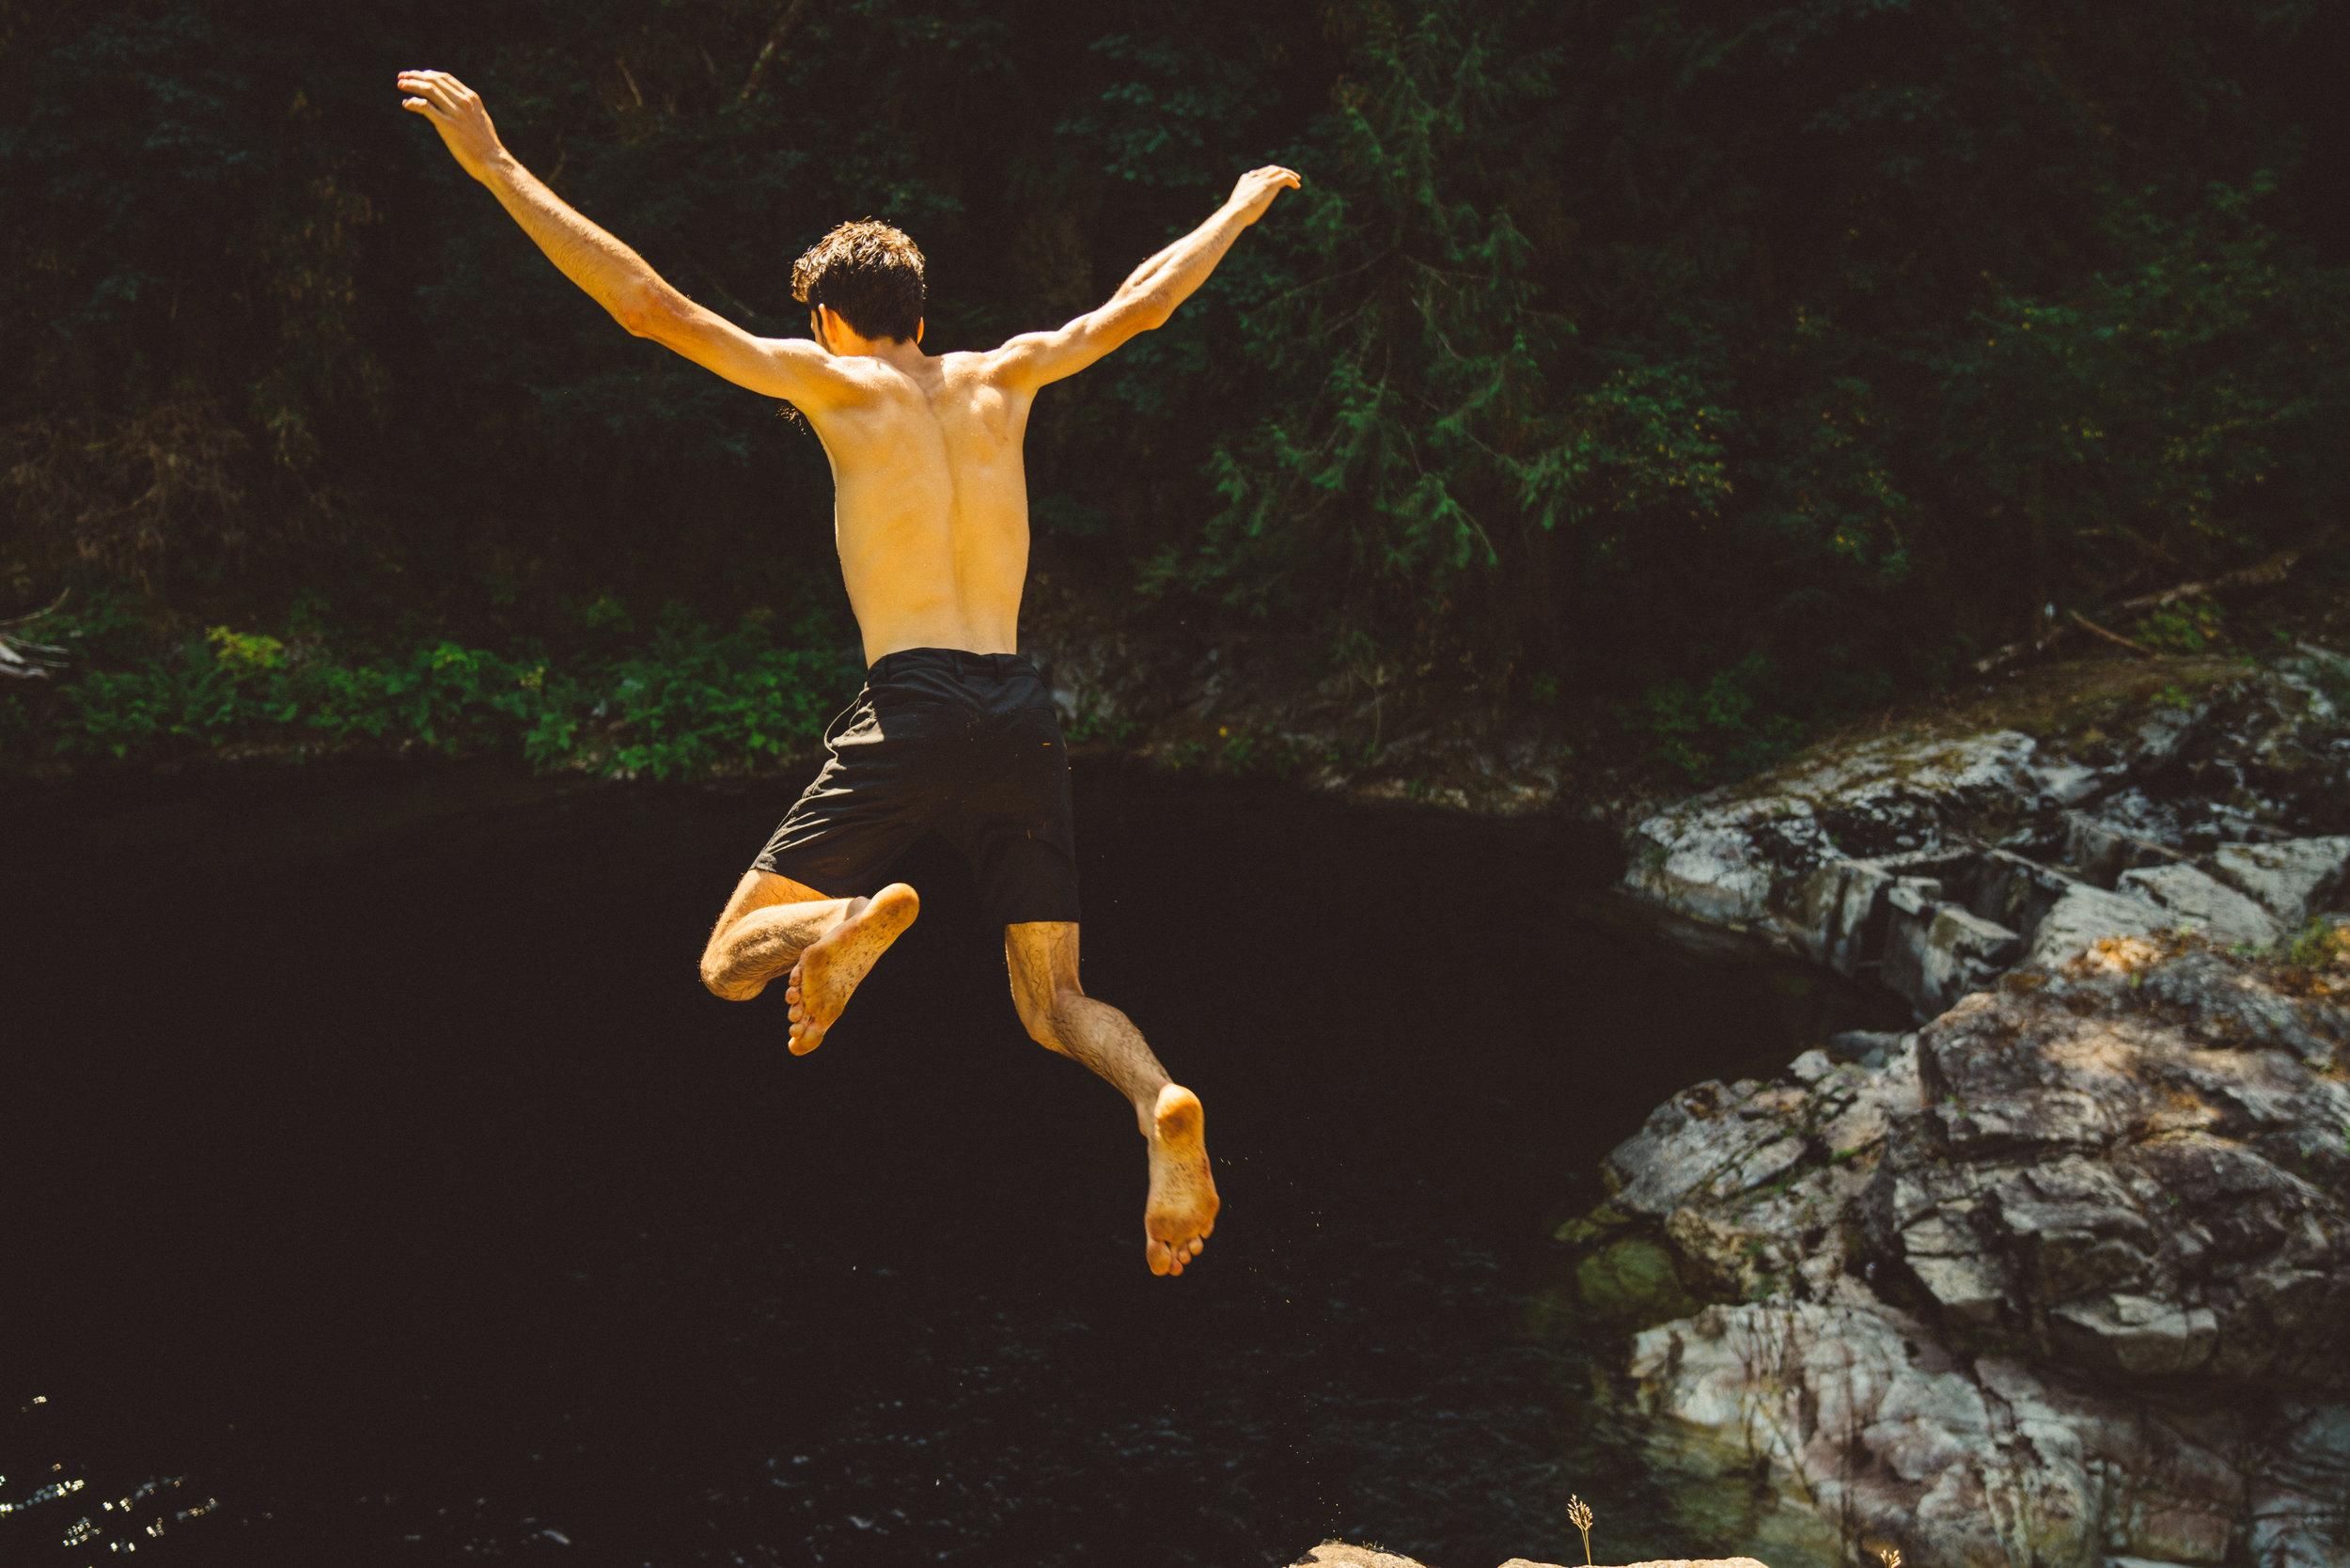 Sam taking a leap.